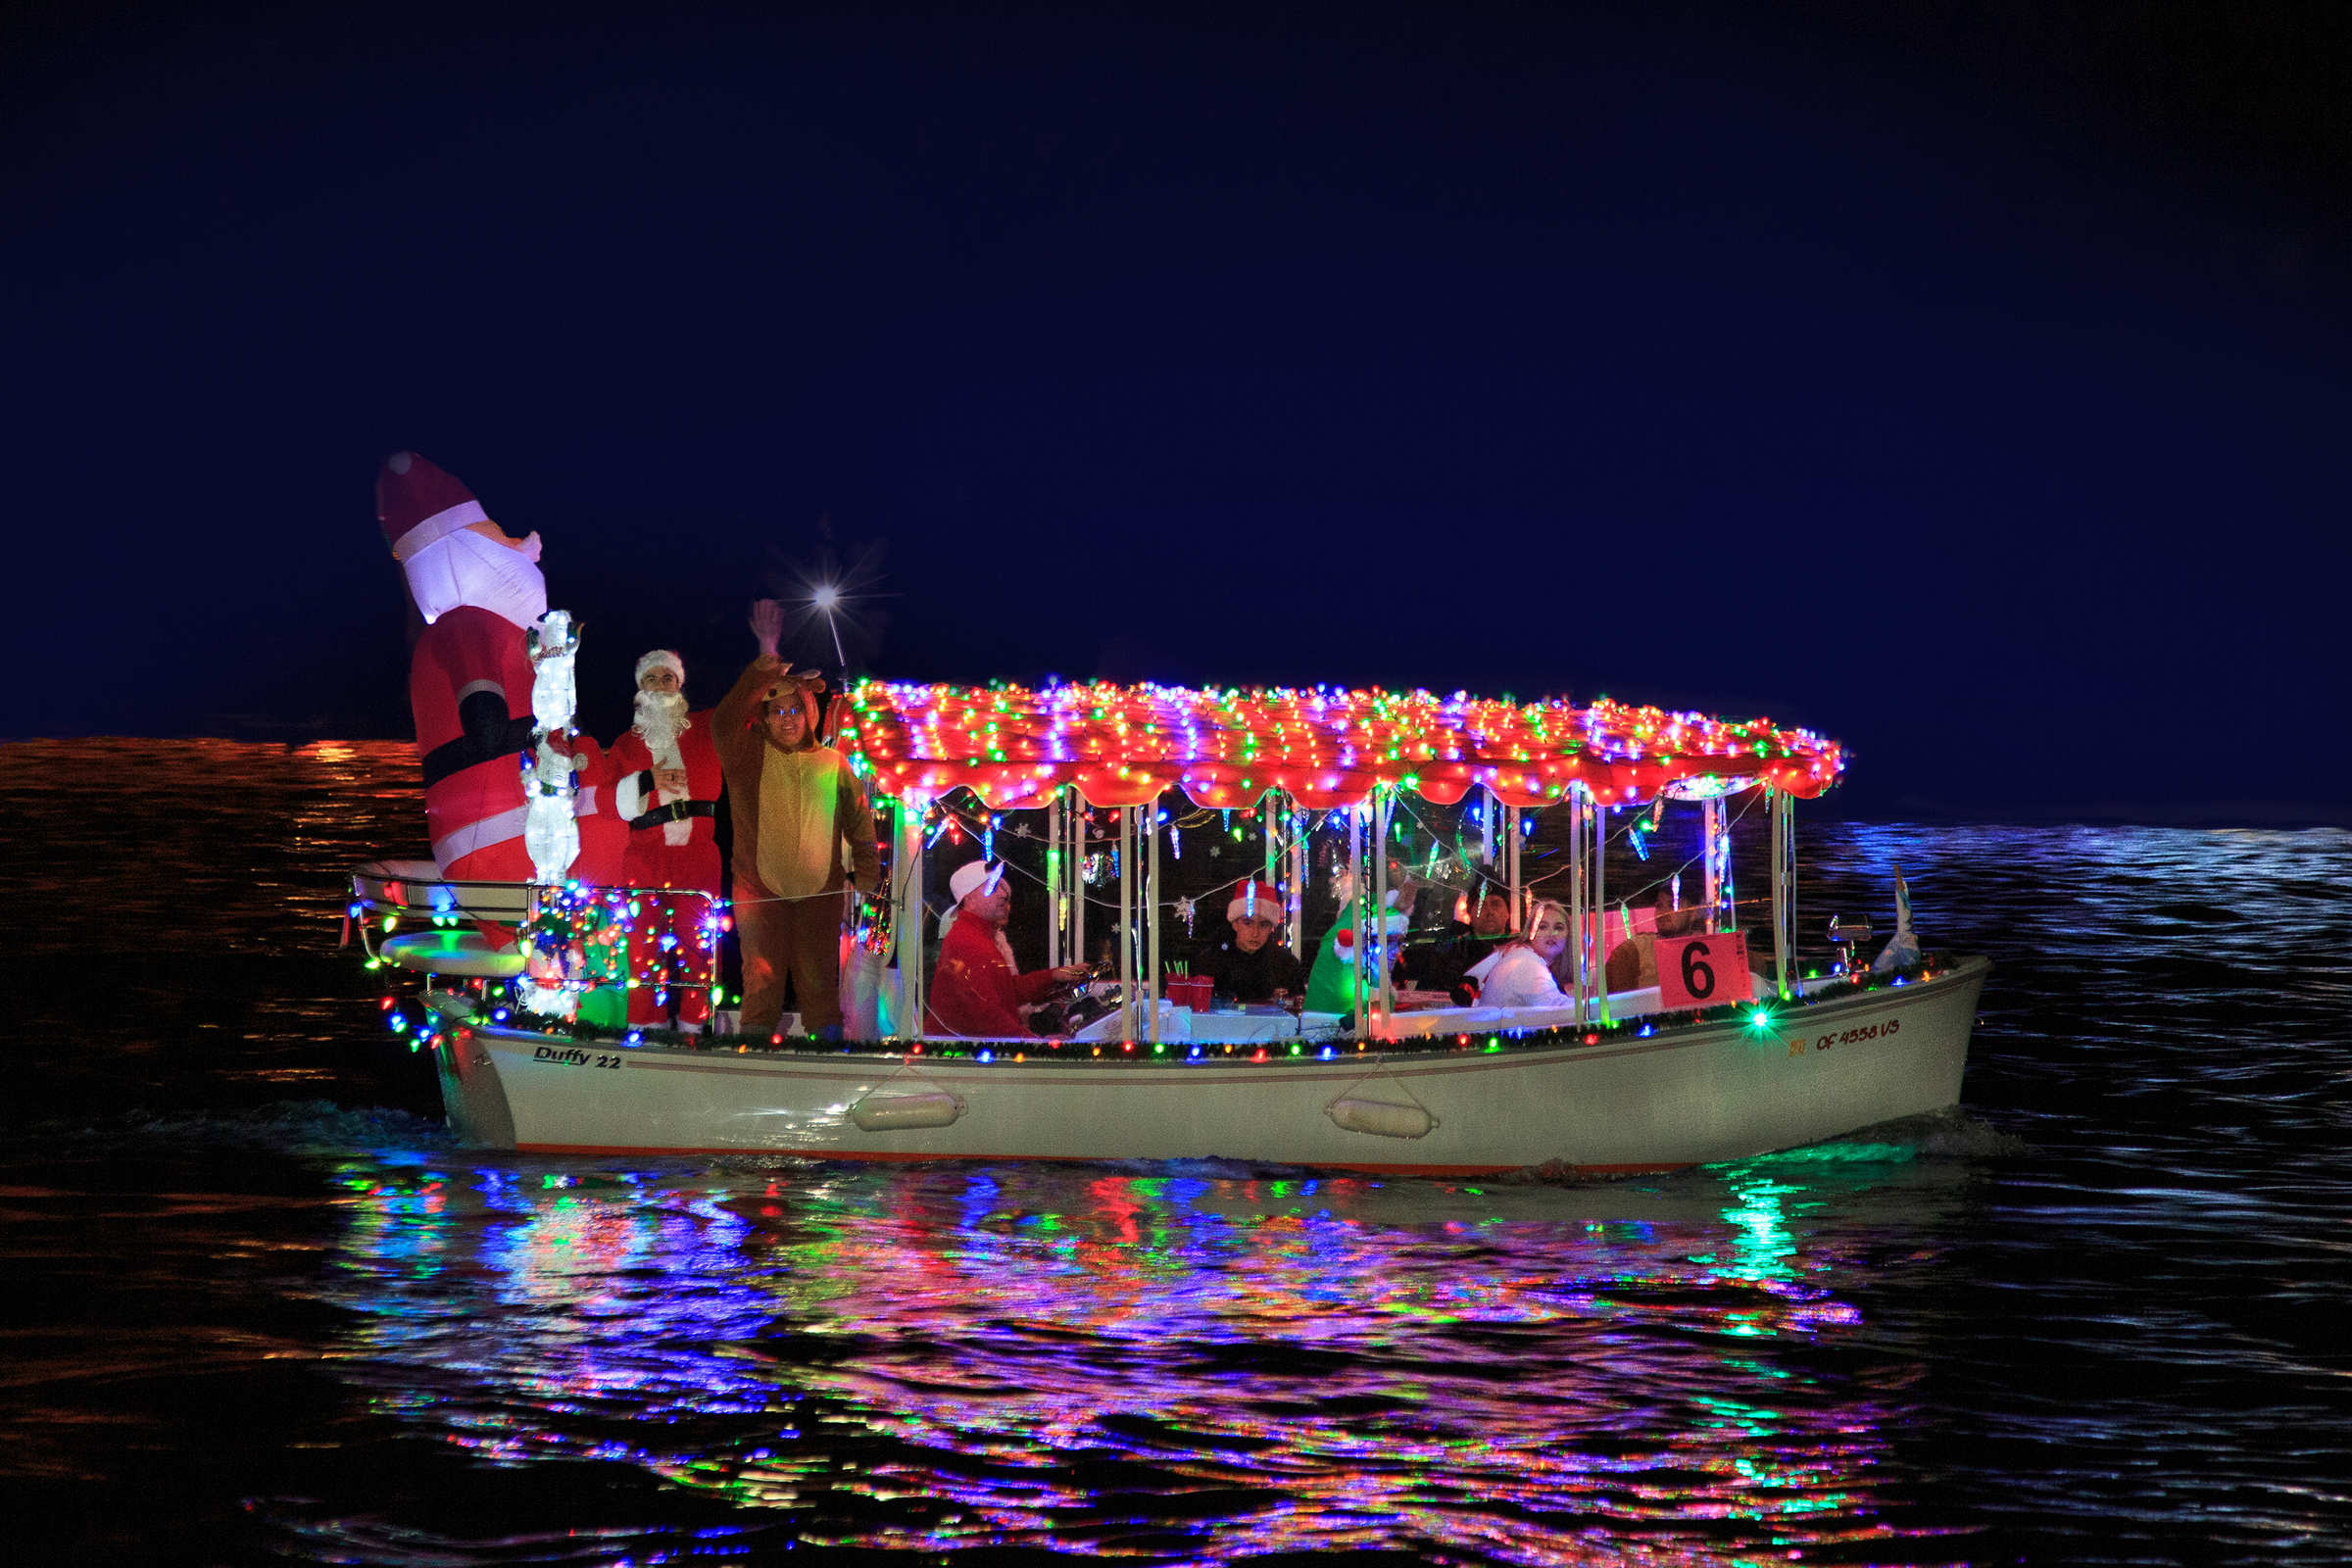 111th Christmas Boat Parade Kicks Off - Newport Beach News